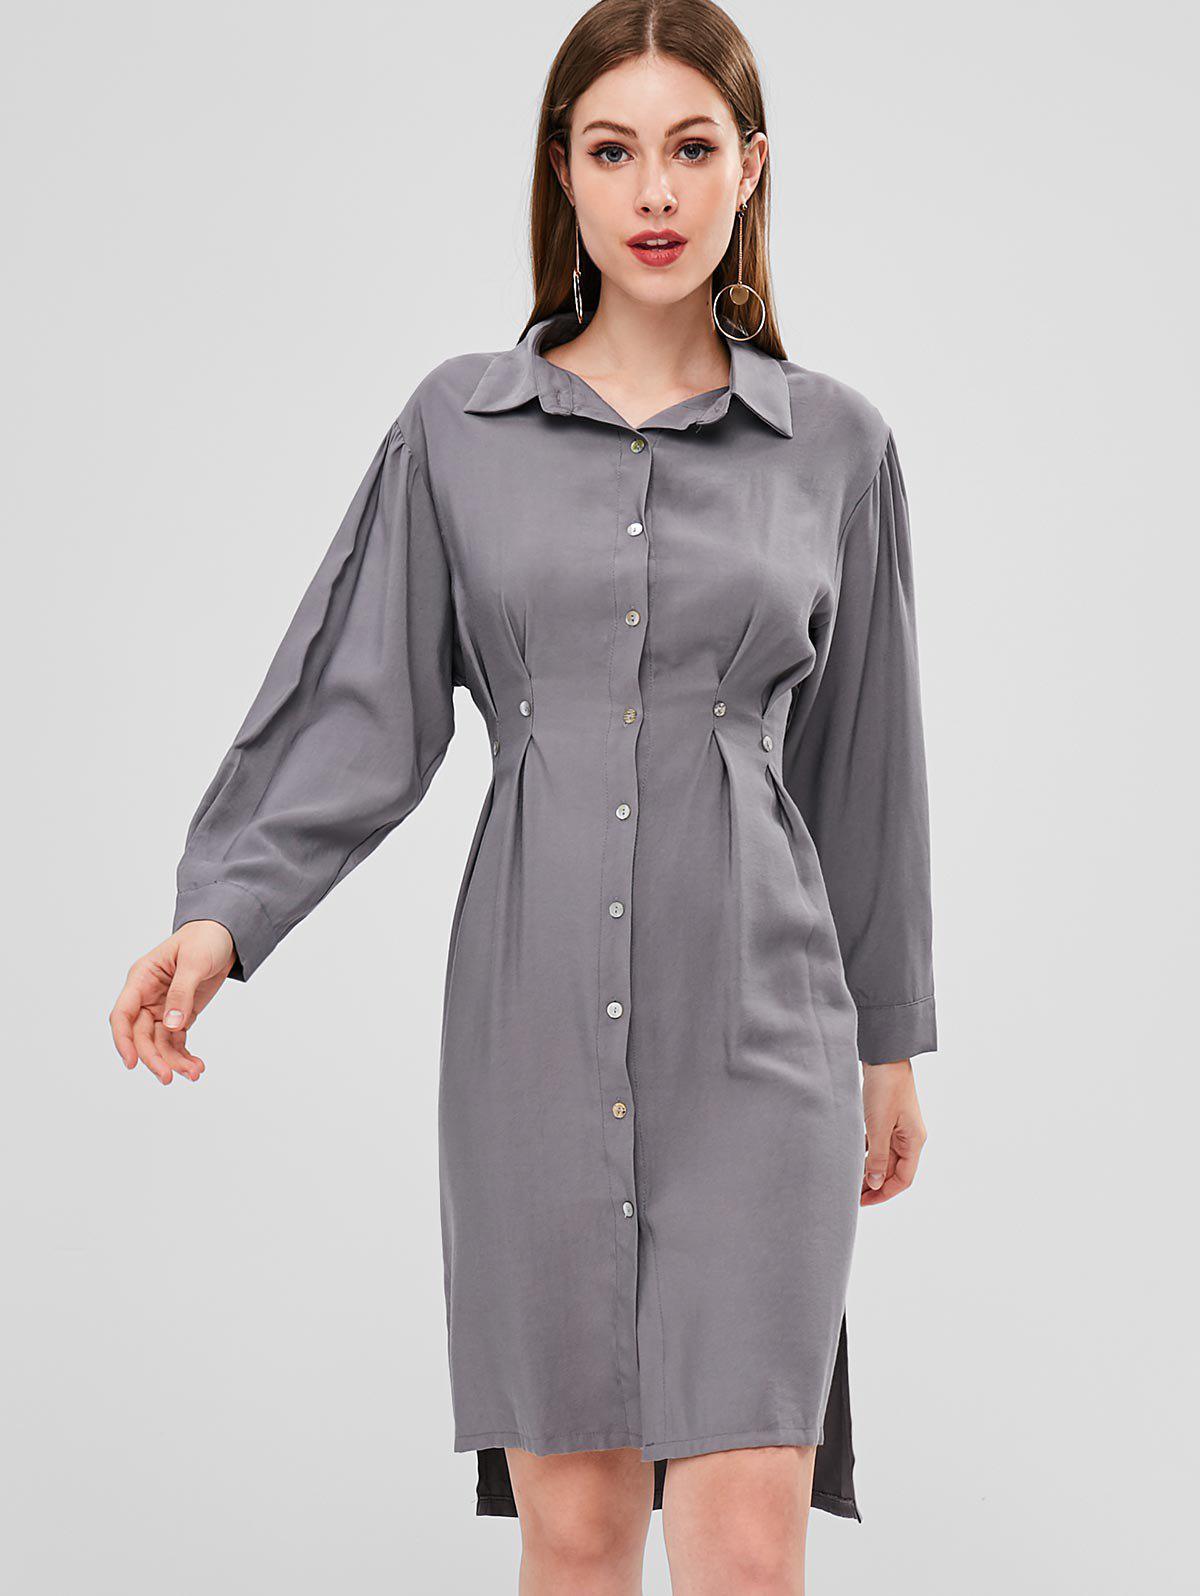 High Low Slit Shirt Dress